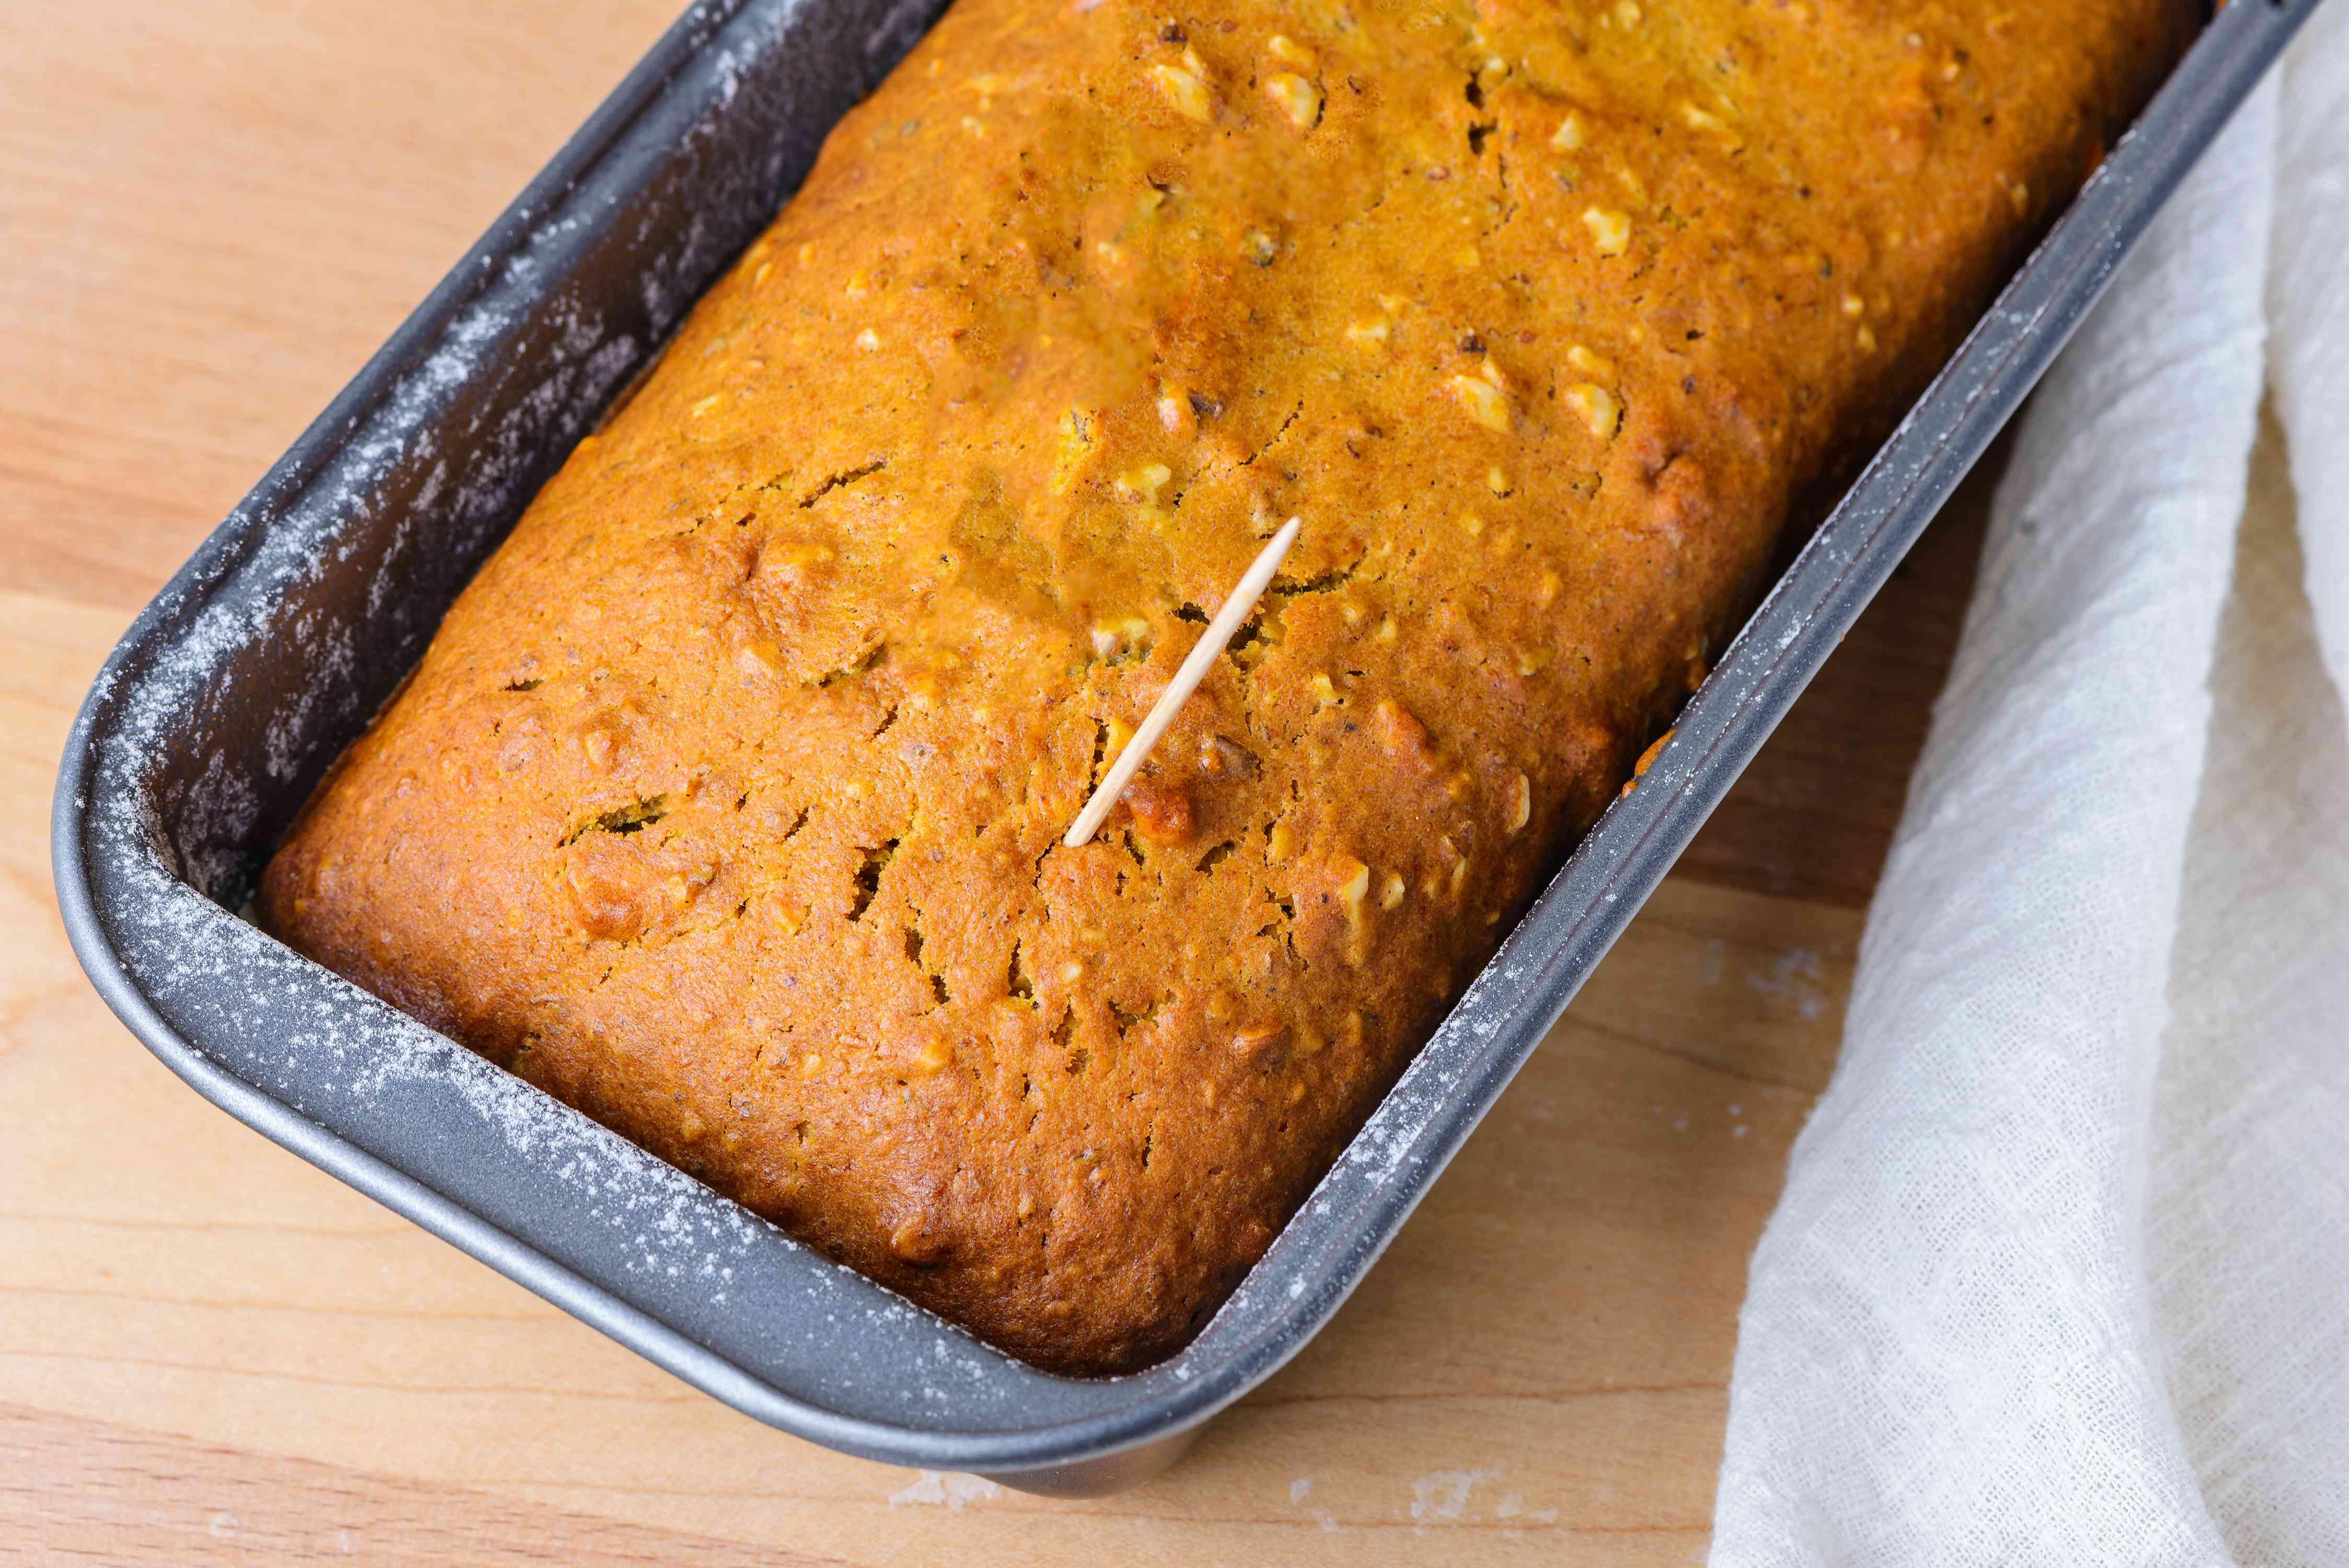 Bake the loaves